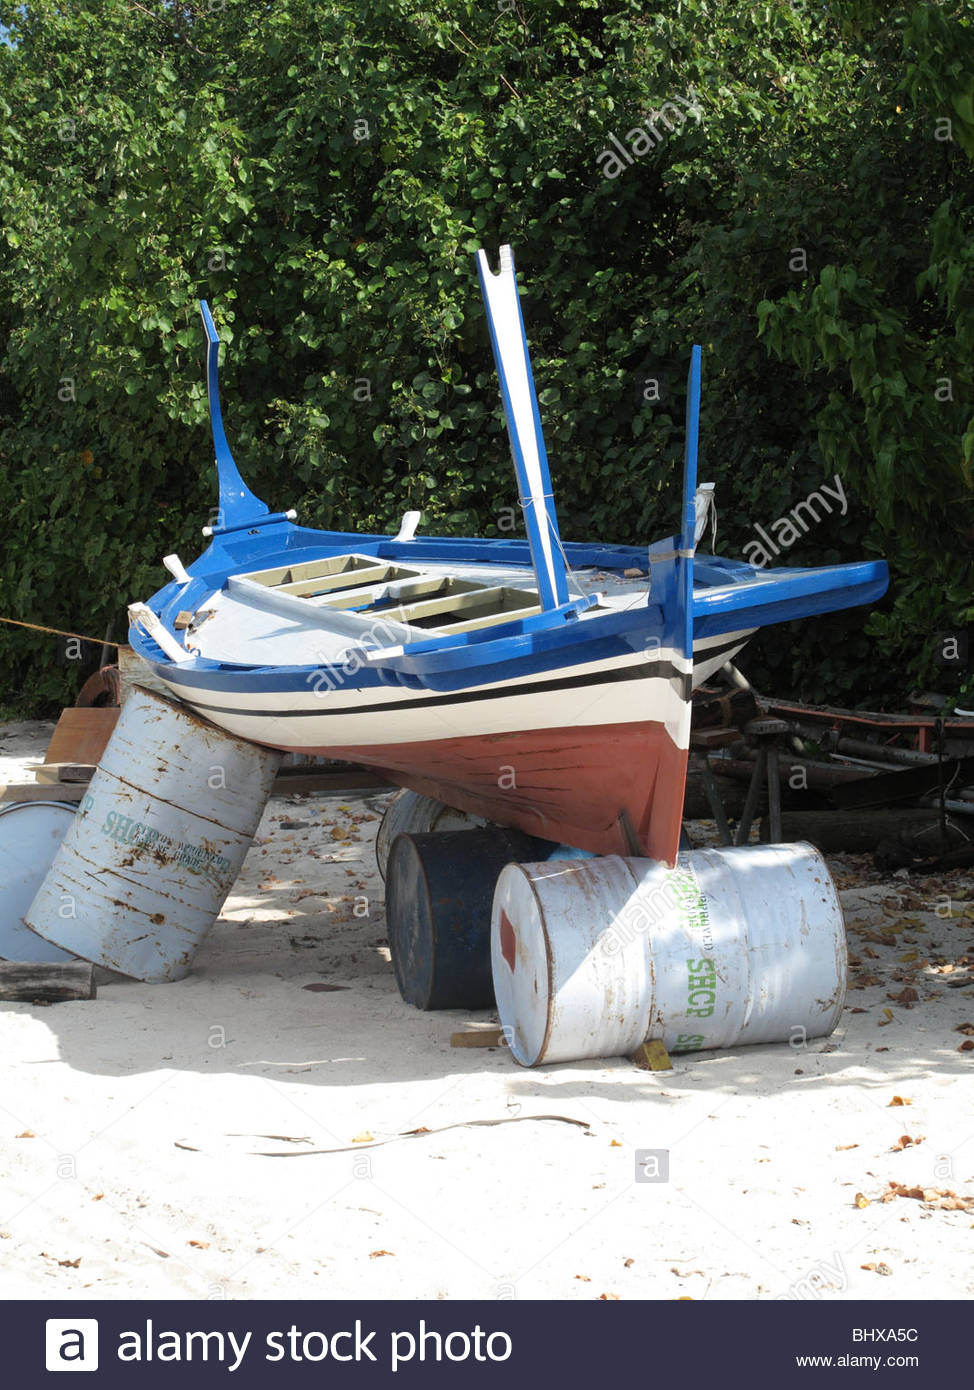 Dhoni - maldivski ribarski čamac Bhxa5c10